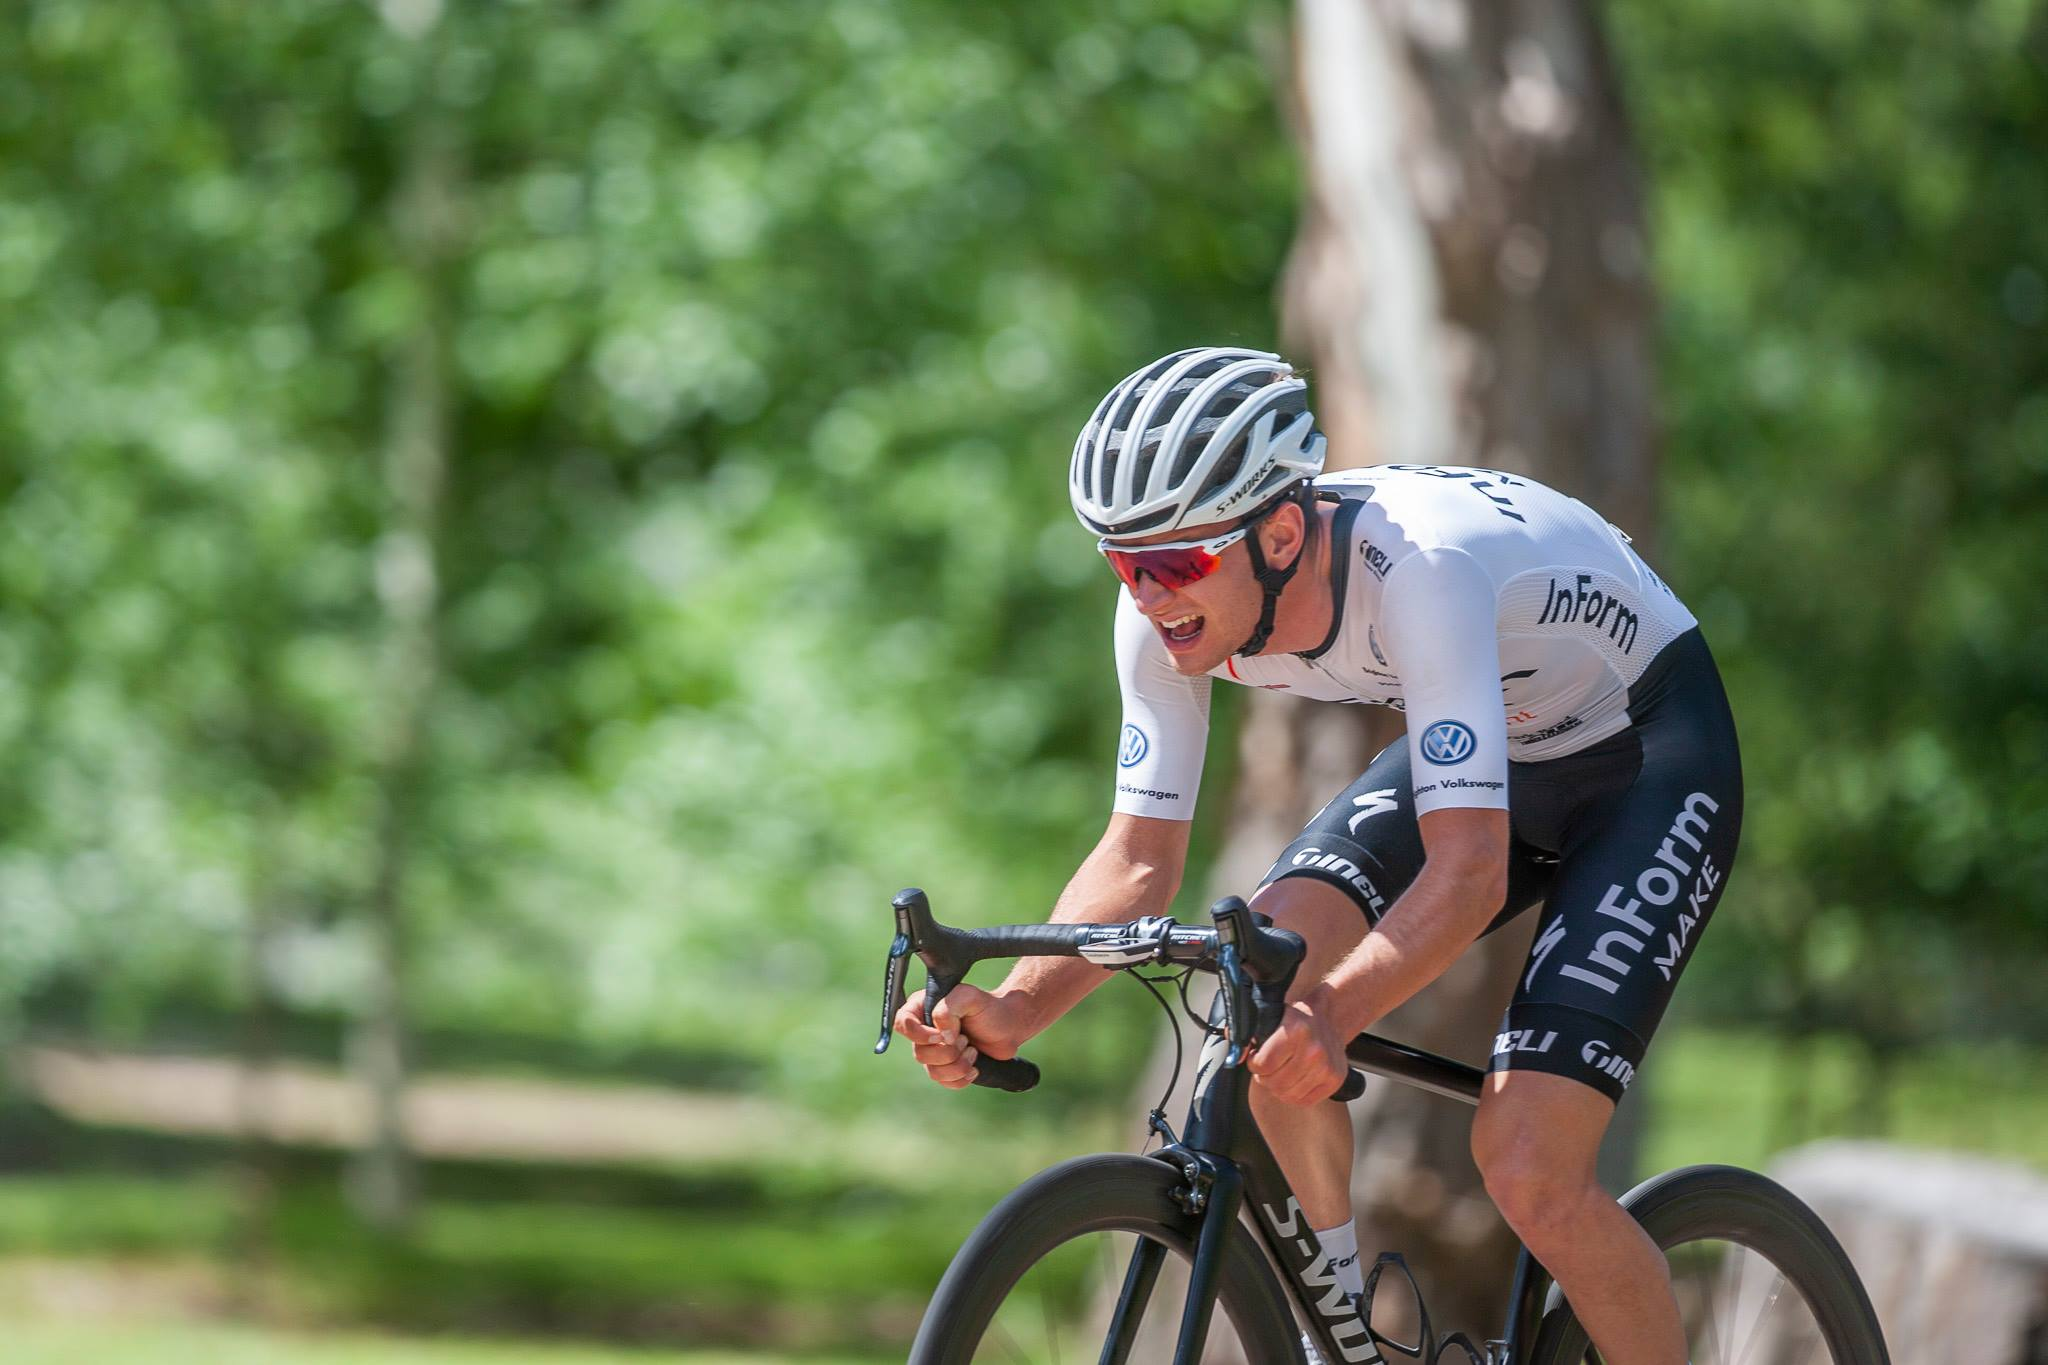 Photo: Cycling Victoria